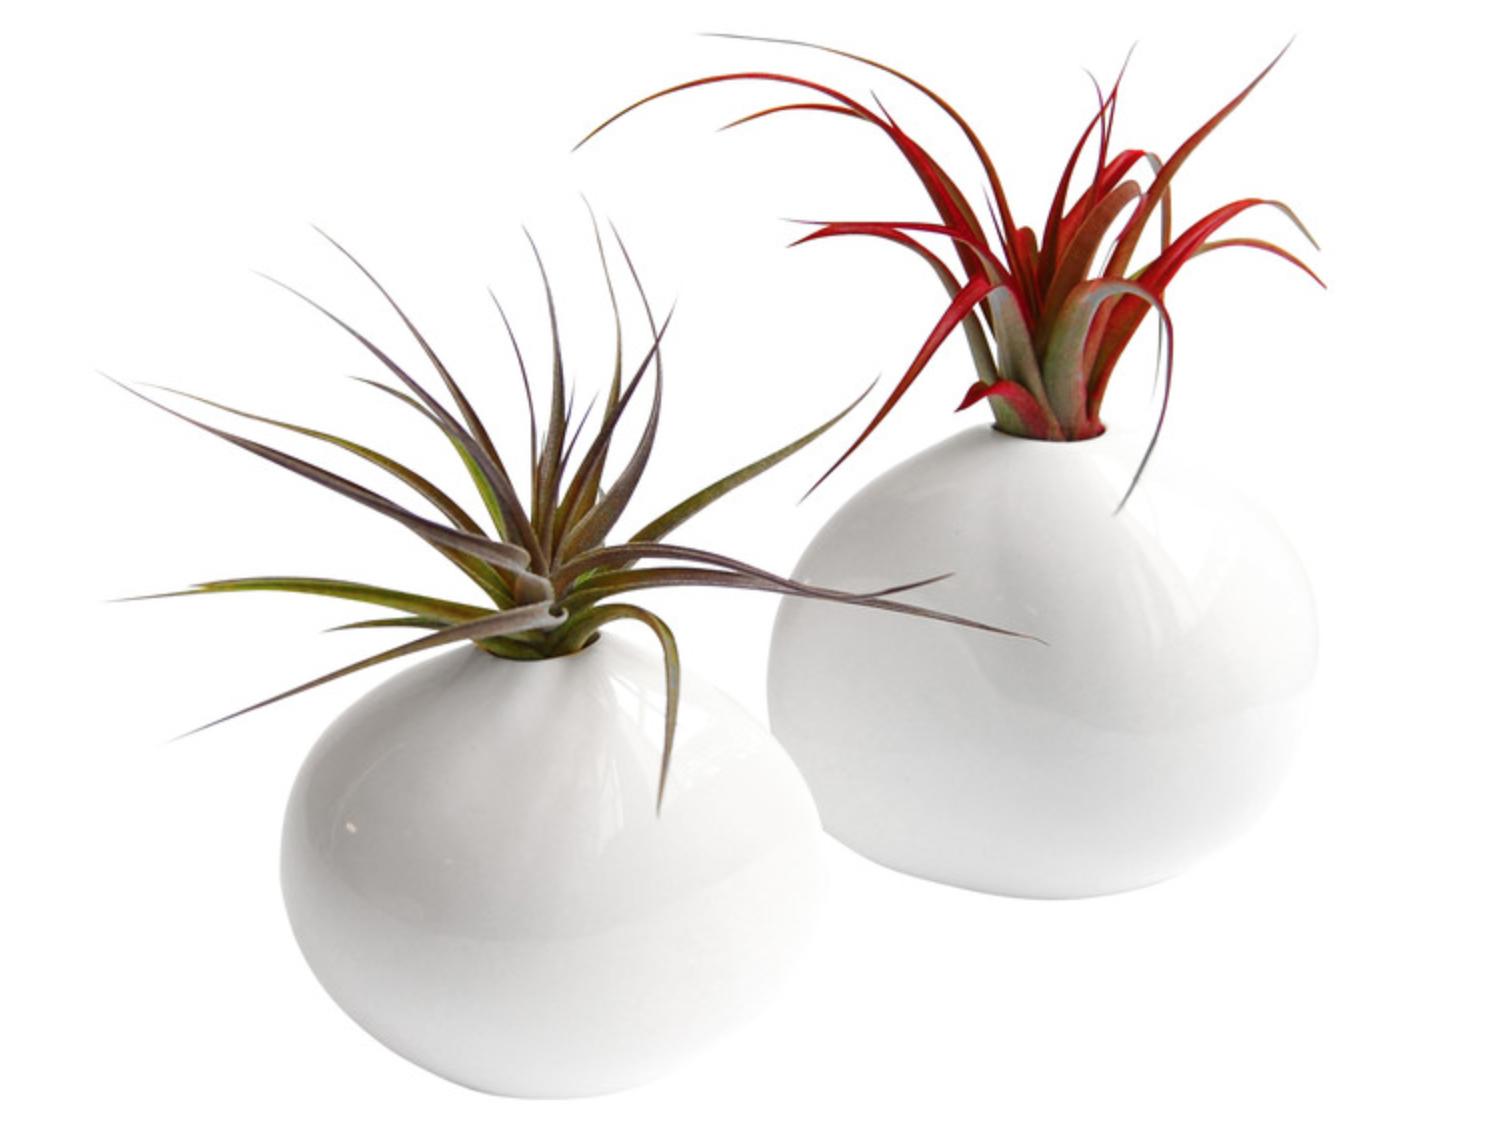 Pebble Porcelain Vases With Air Plants